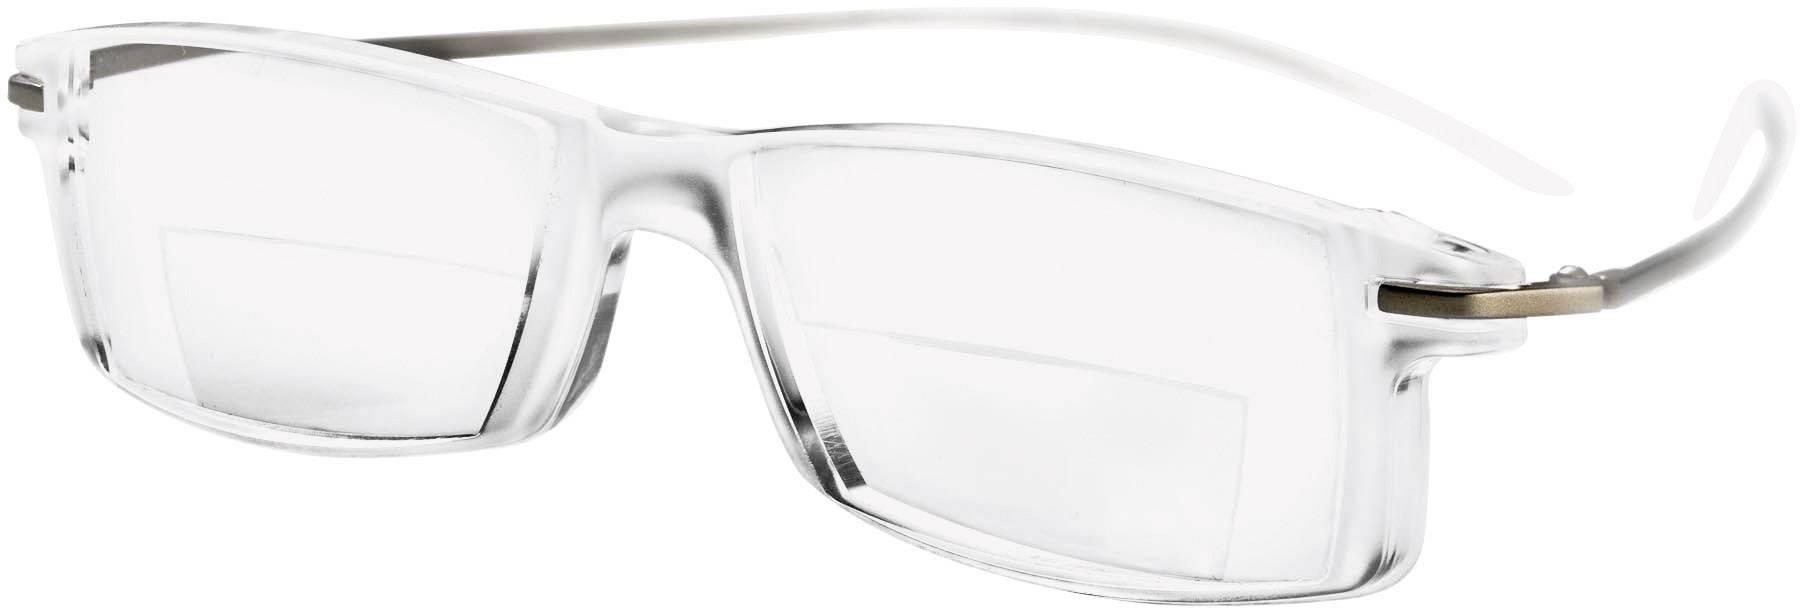 Loepbril Vergrotingsfactor: 2.5 x Eschenbach MINIFRAME BIFO | Conrad.be